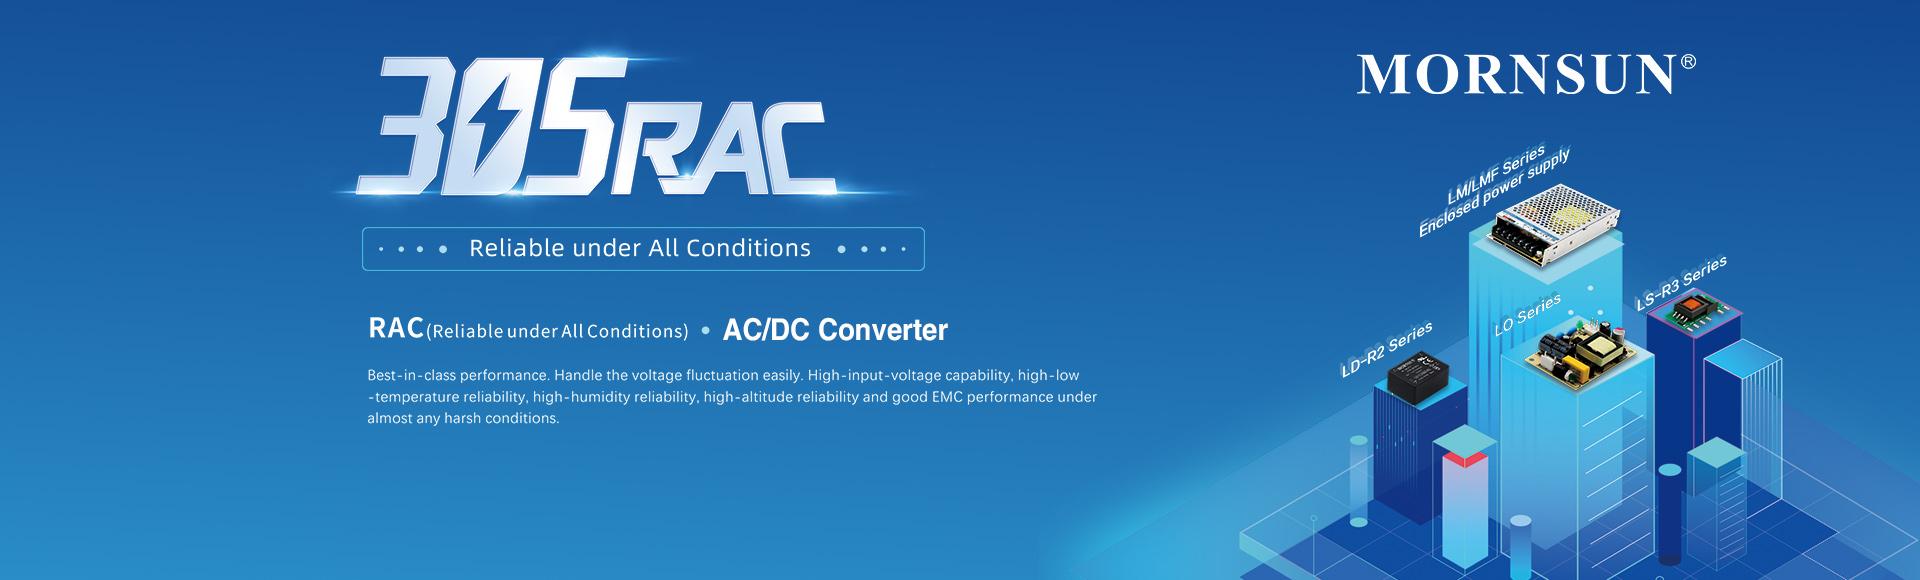 305 RAC AC/DC Converter